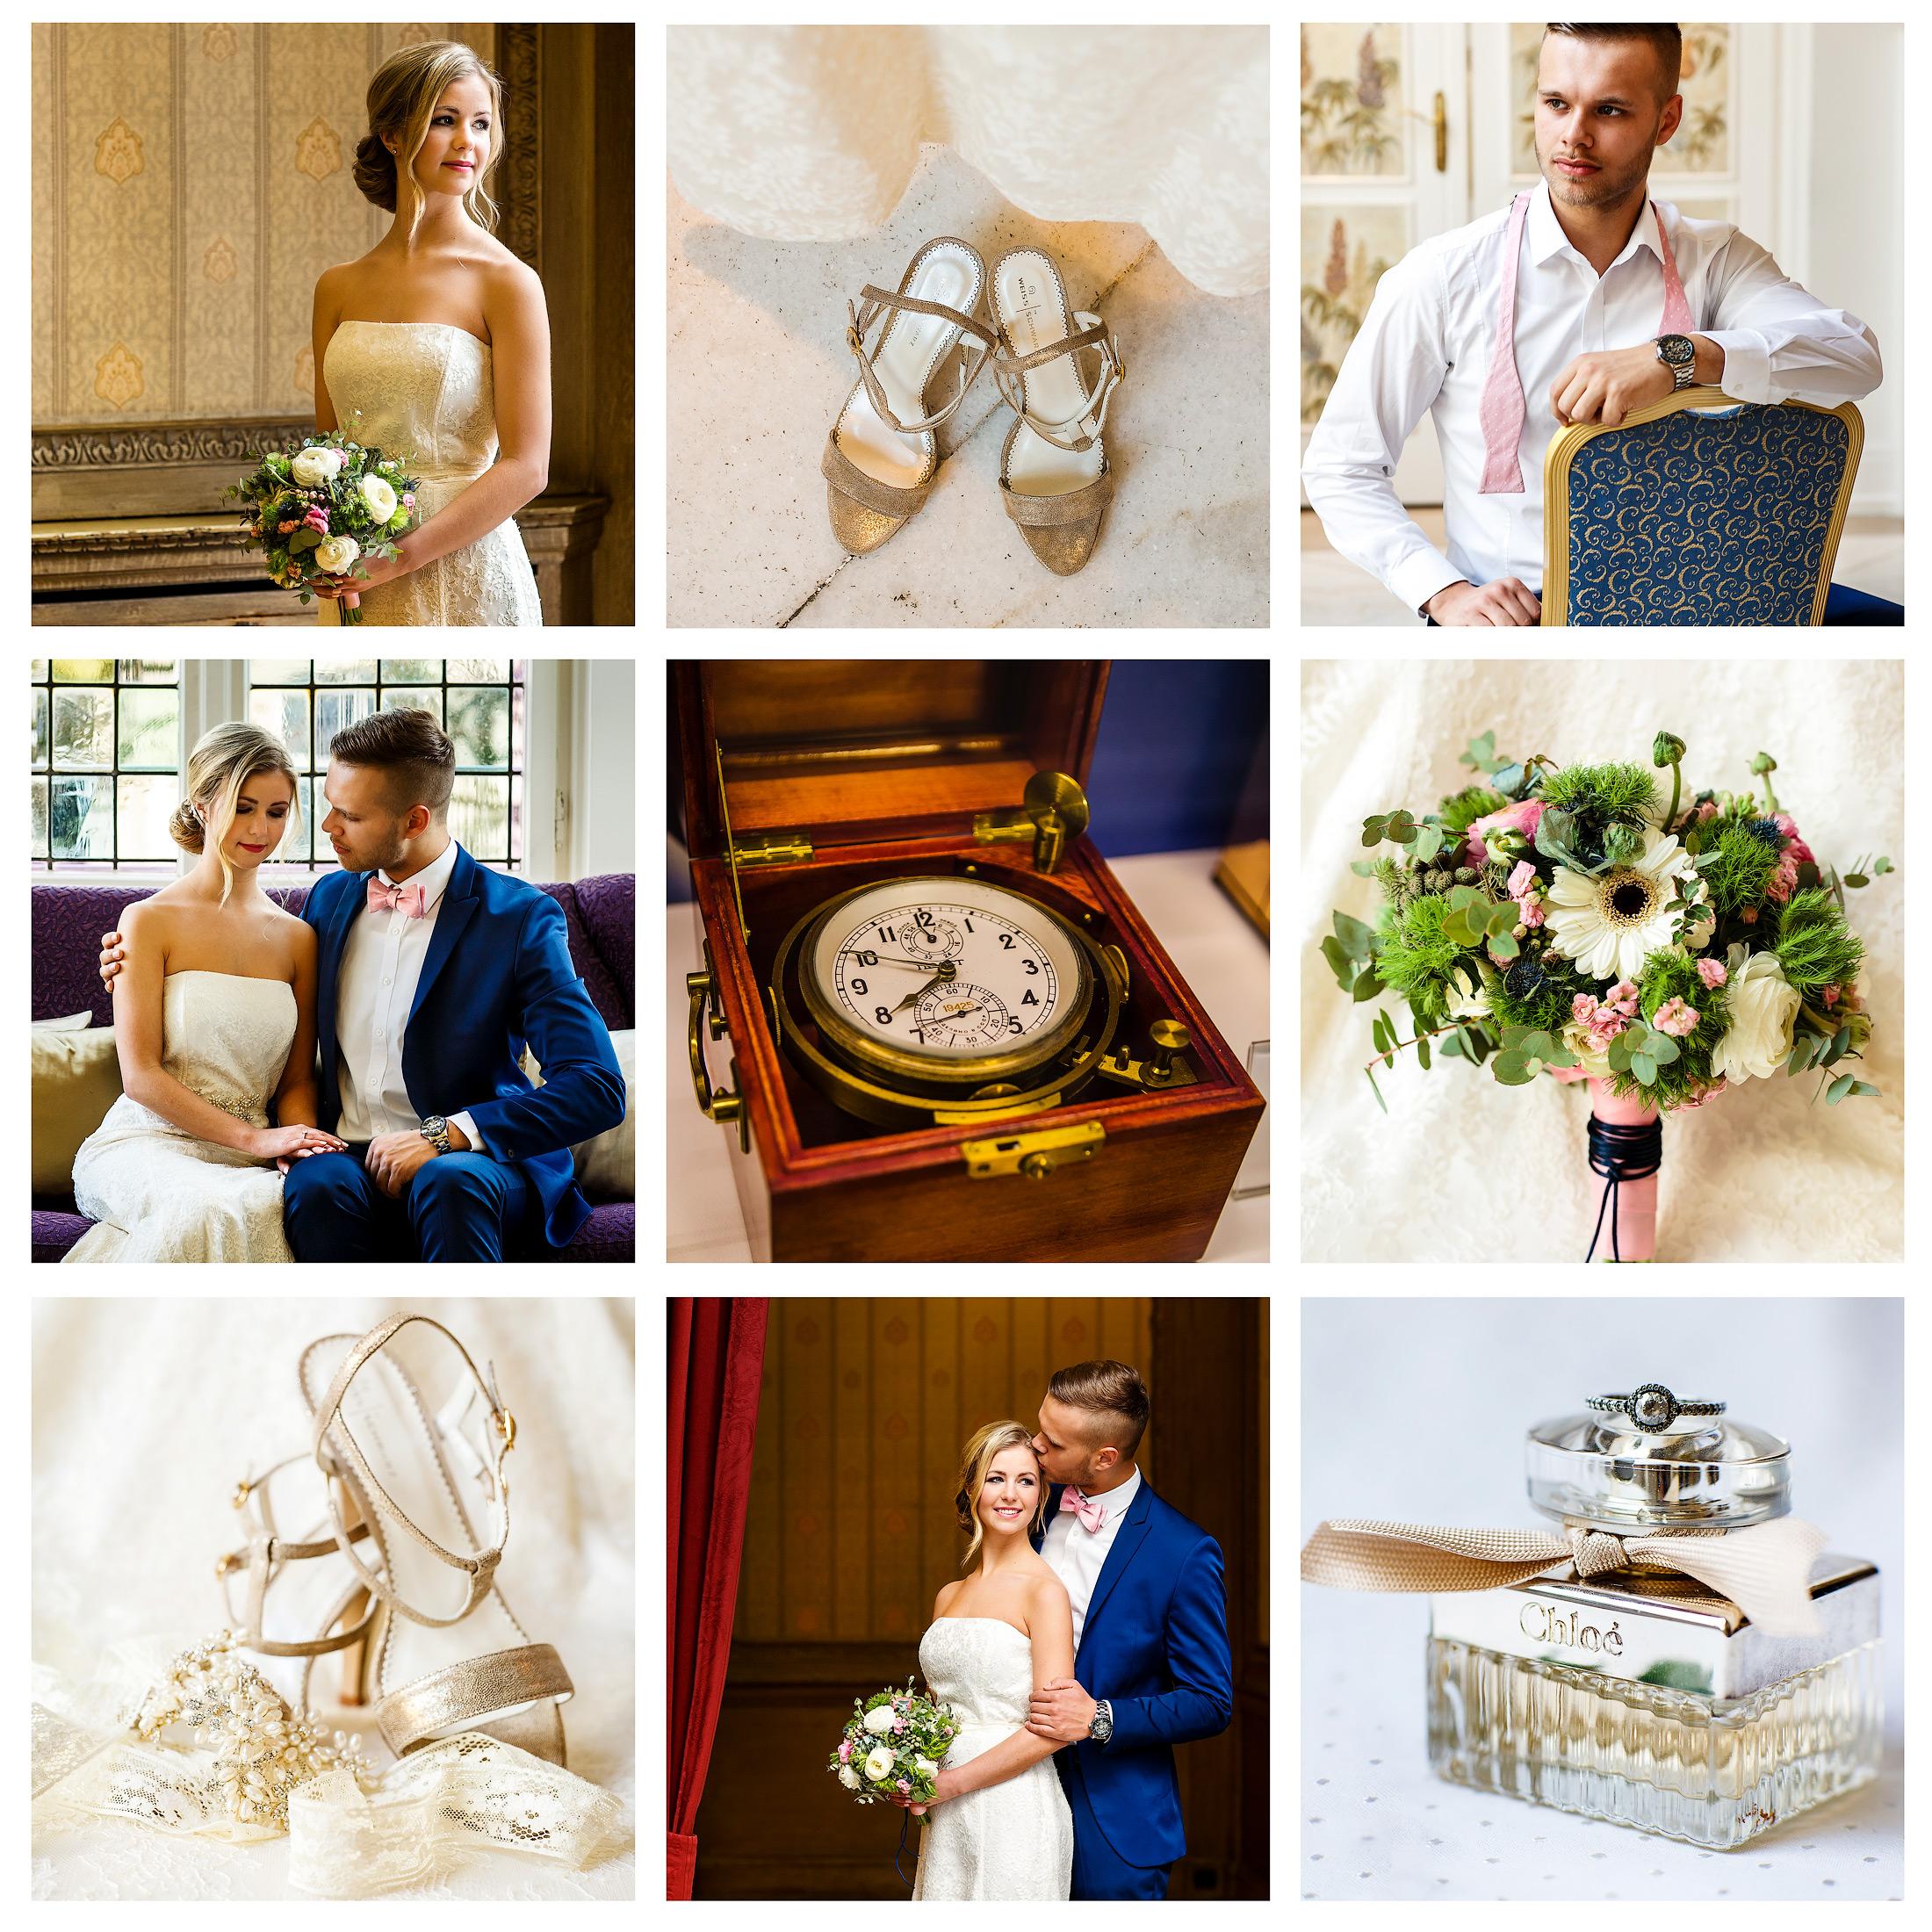 Hochzeitsfotografie All Inclusive Bundle